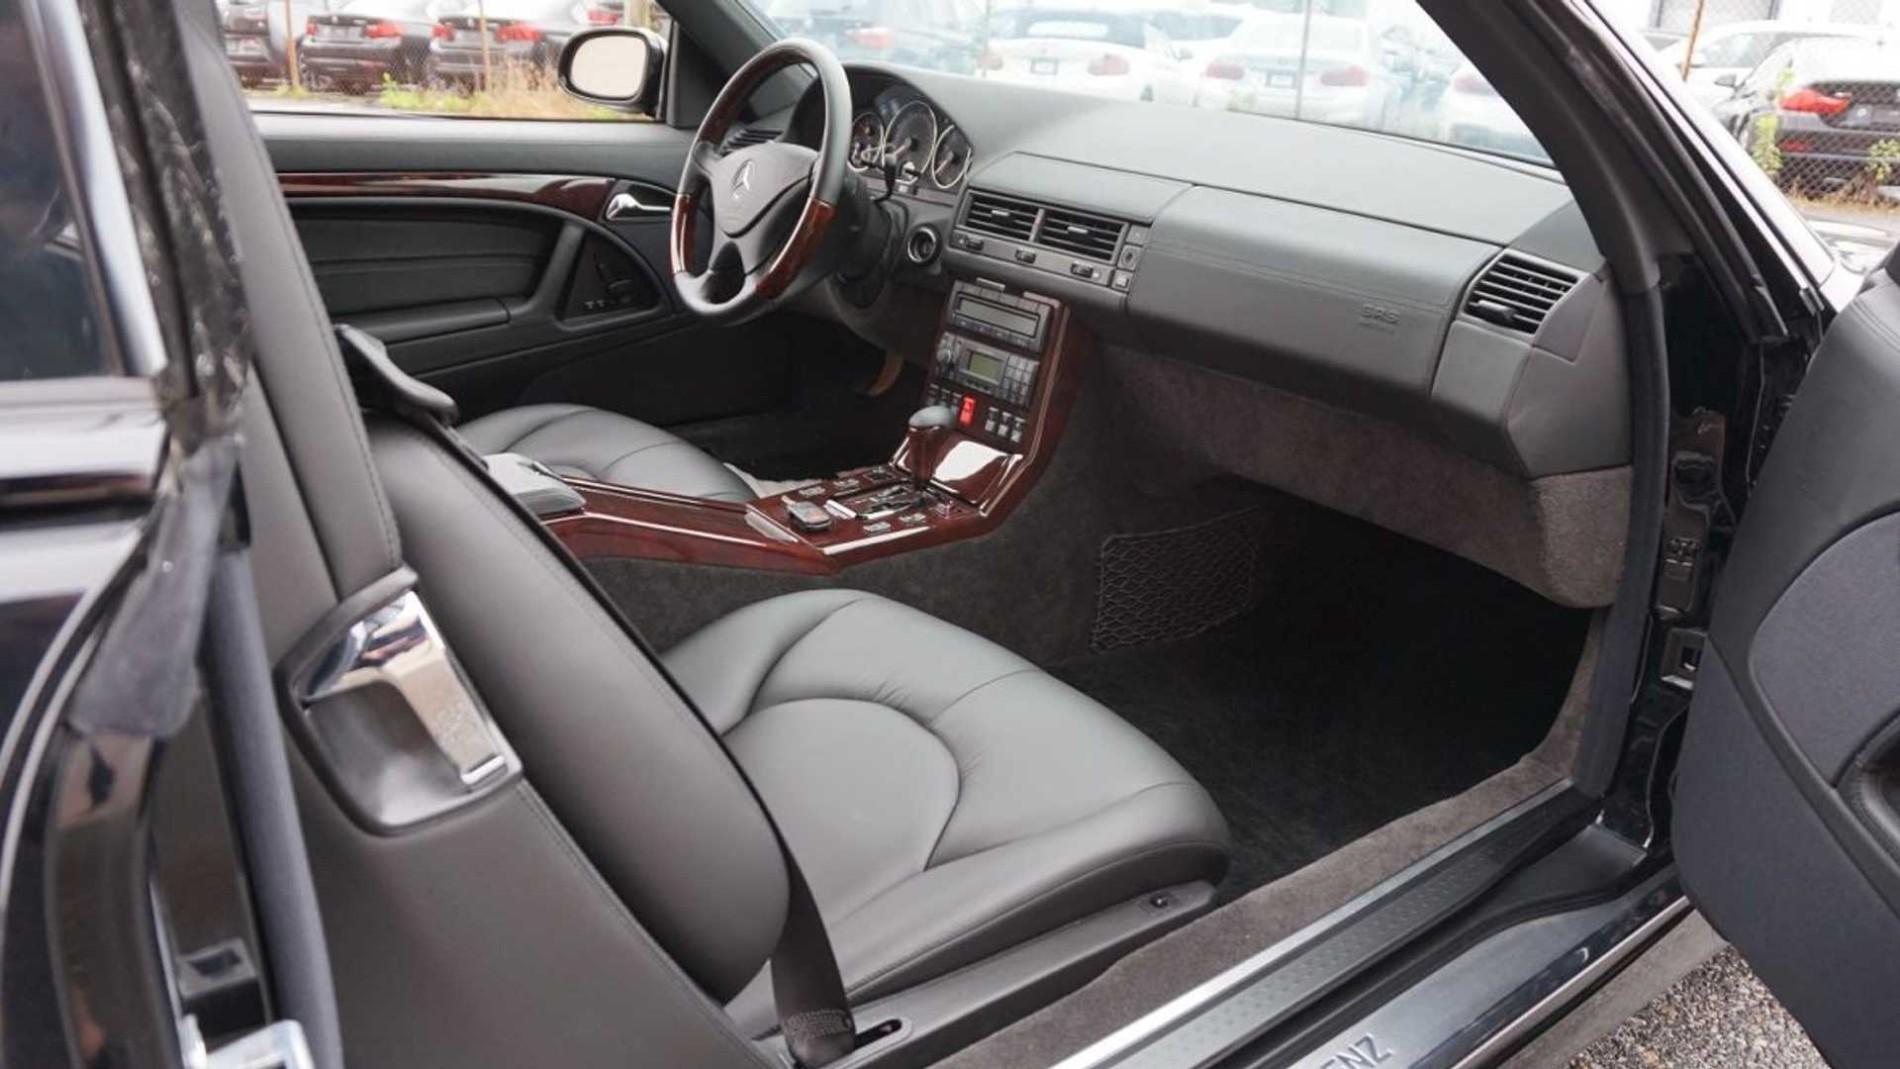 Mercedes-Benz SL600 de vanzare - Mercedes-Benz SL600 de vanzare